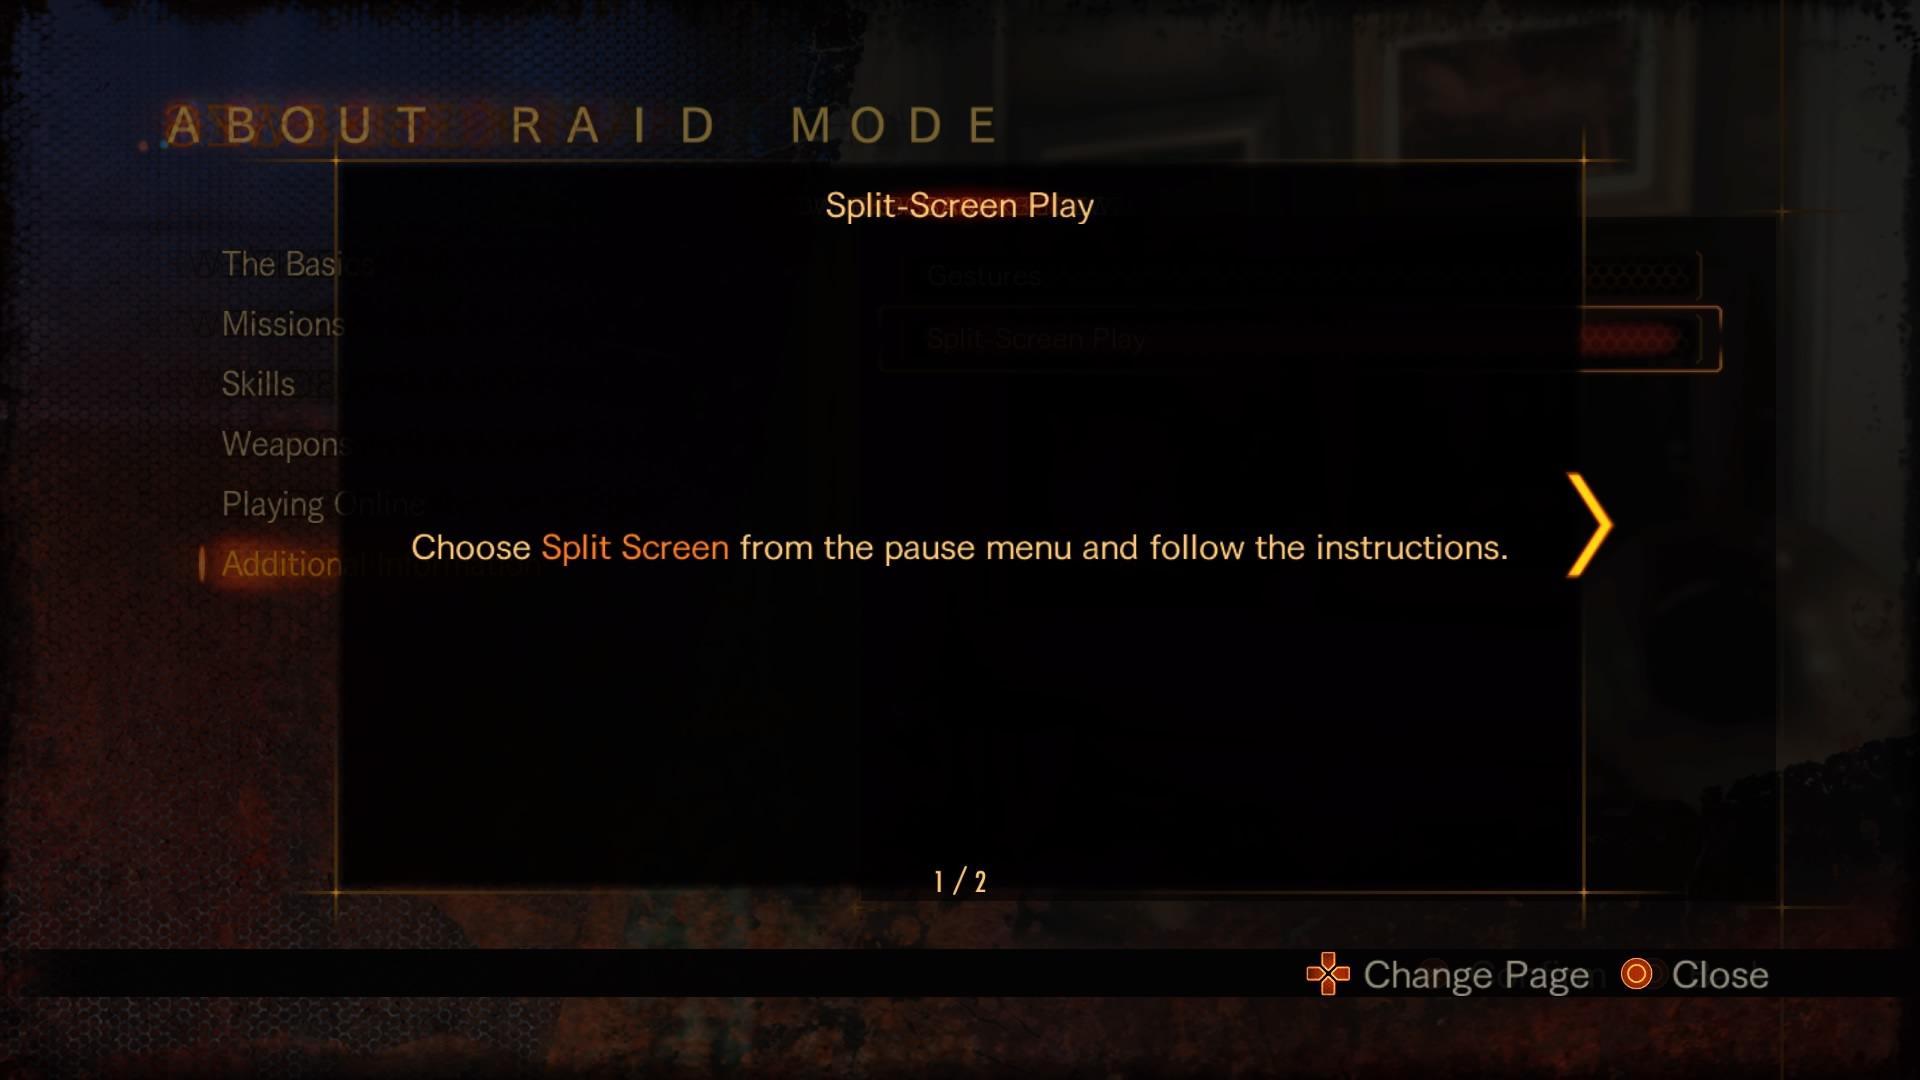 Split-Screen Play